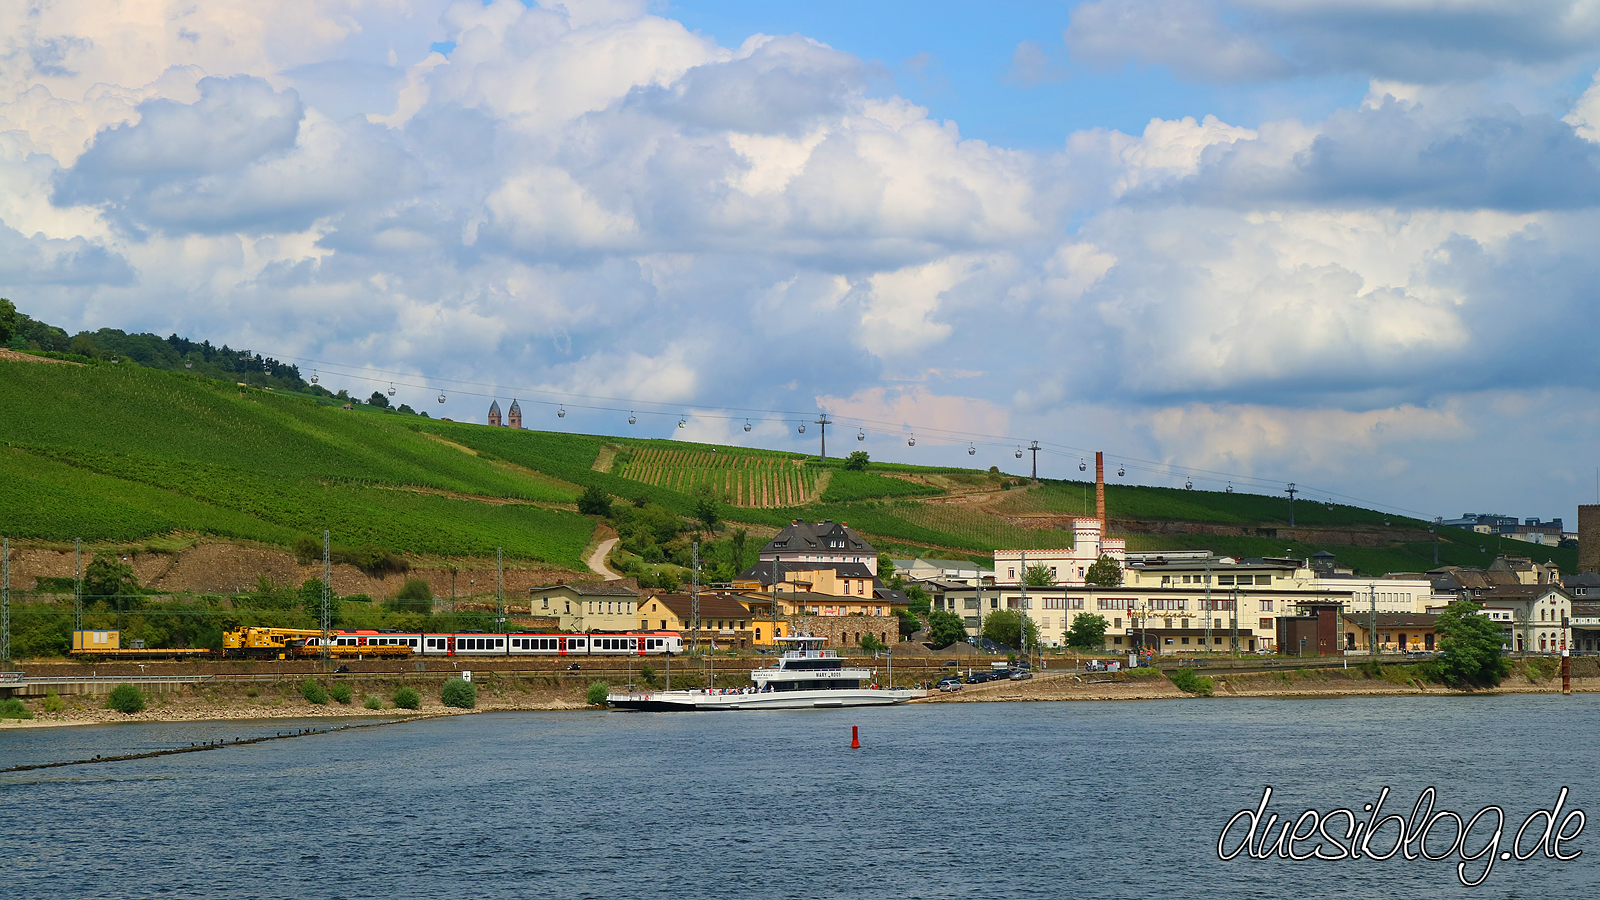 Ruedesheim Rheingau Travelblog duesiblog 154